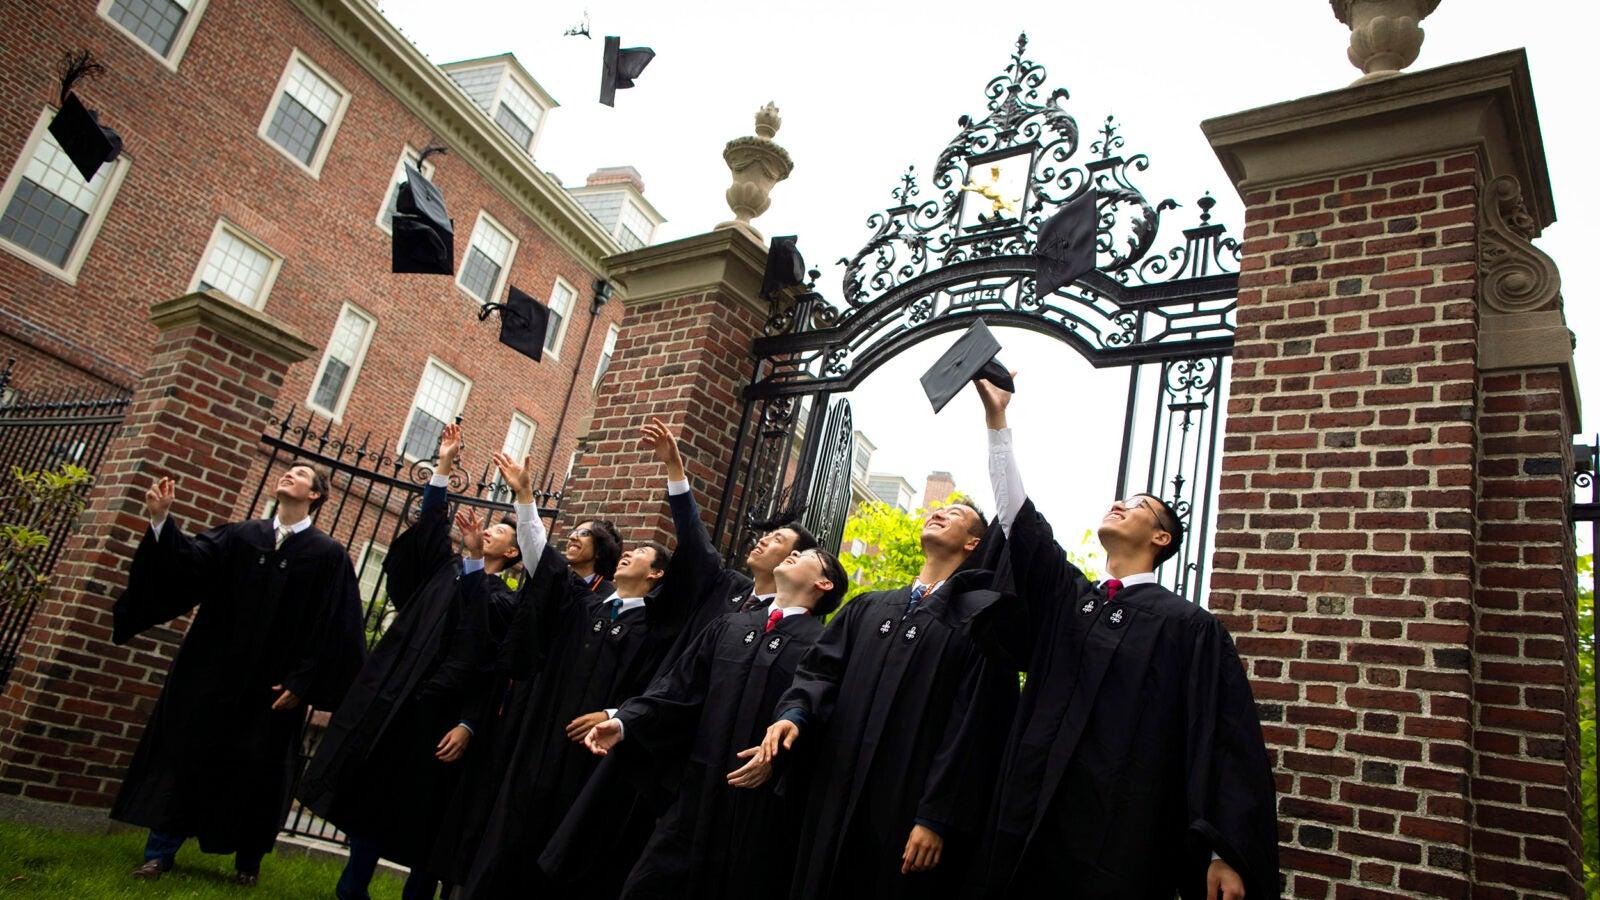 Graduates toss their caps in the air